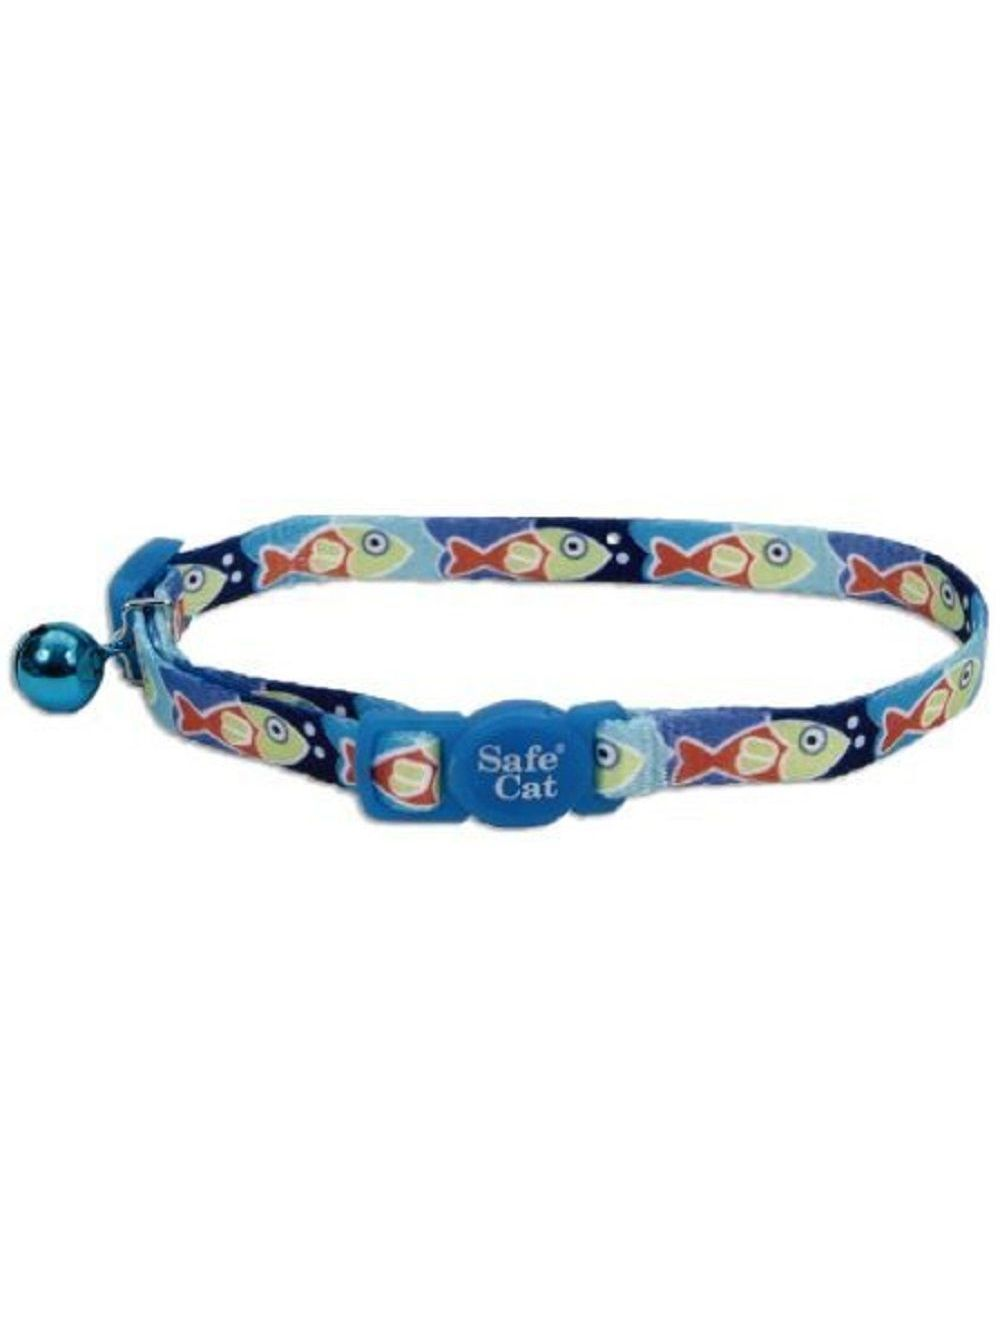 Collar Coastal gato fashion peces azul - Ciudaddemascotas.com